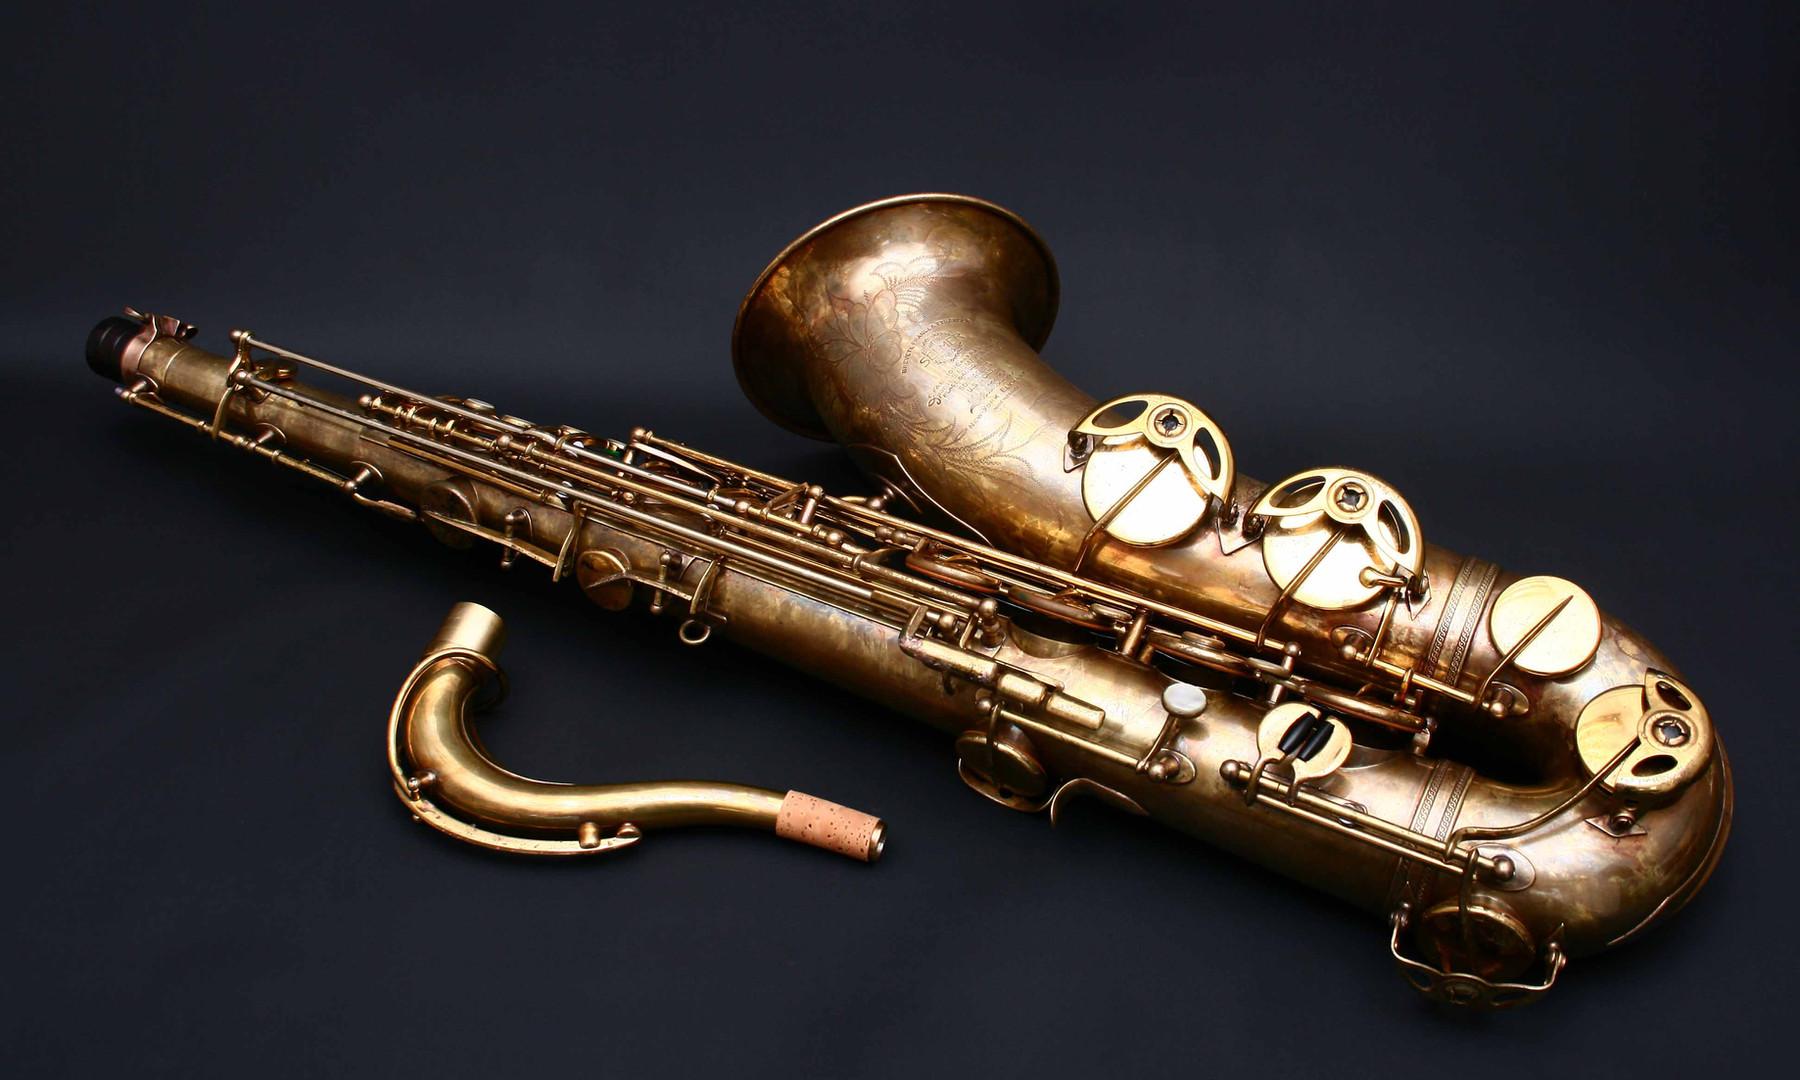 Tenor Saxophon Selmer Super Balanced Action - Saxophon Manufaktur Marx